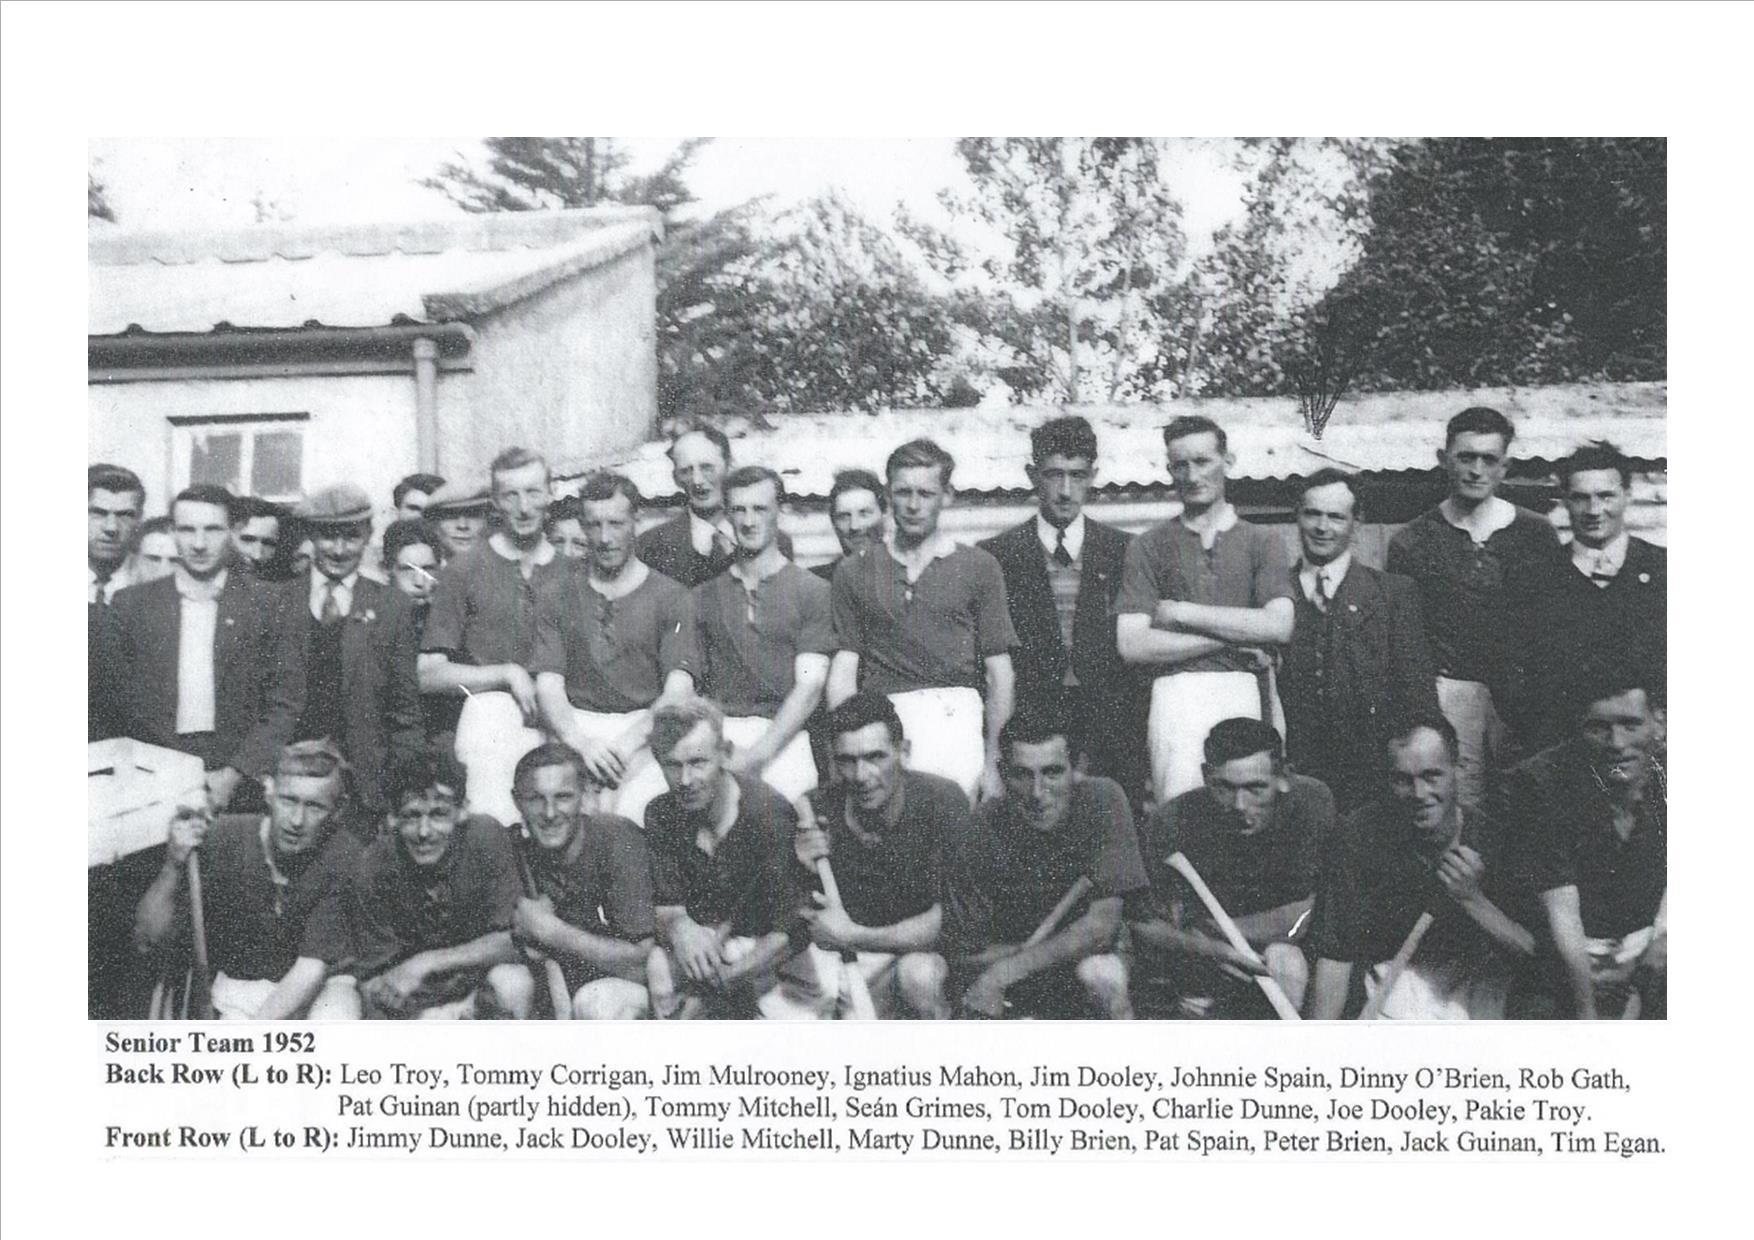 Drumcullen Senior Team - 1952